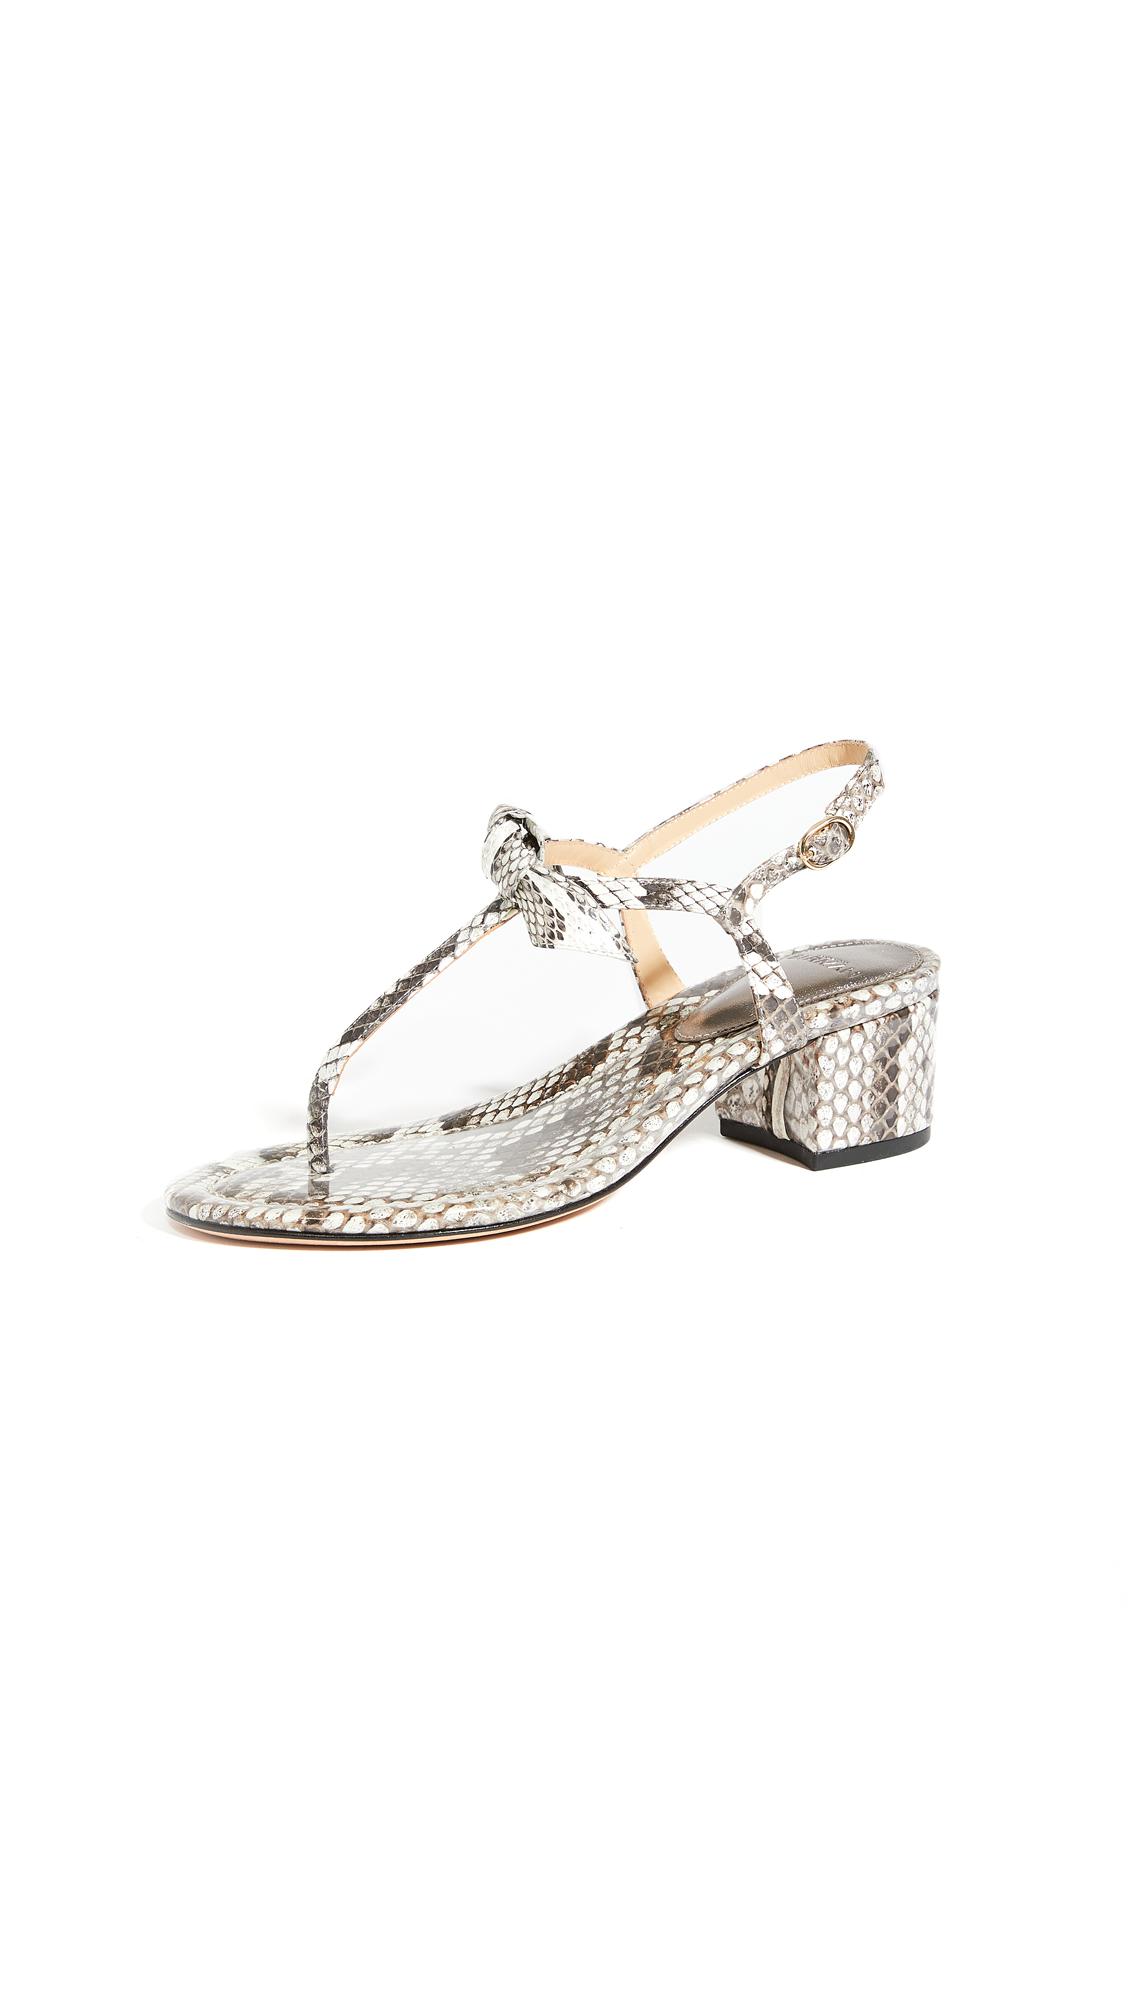 Alexandre Birman 45mm Clarita T Sandals - 40% Off Sale